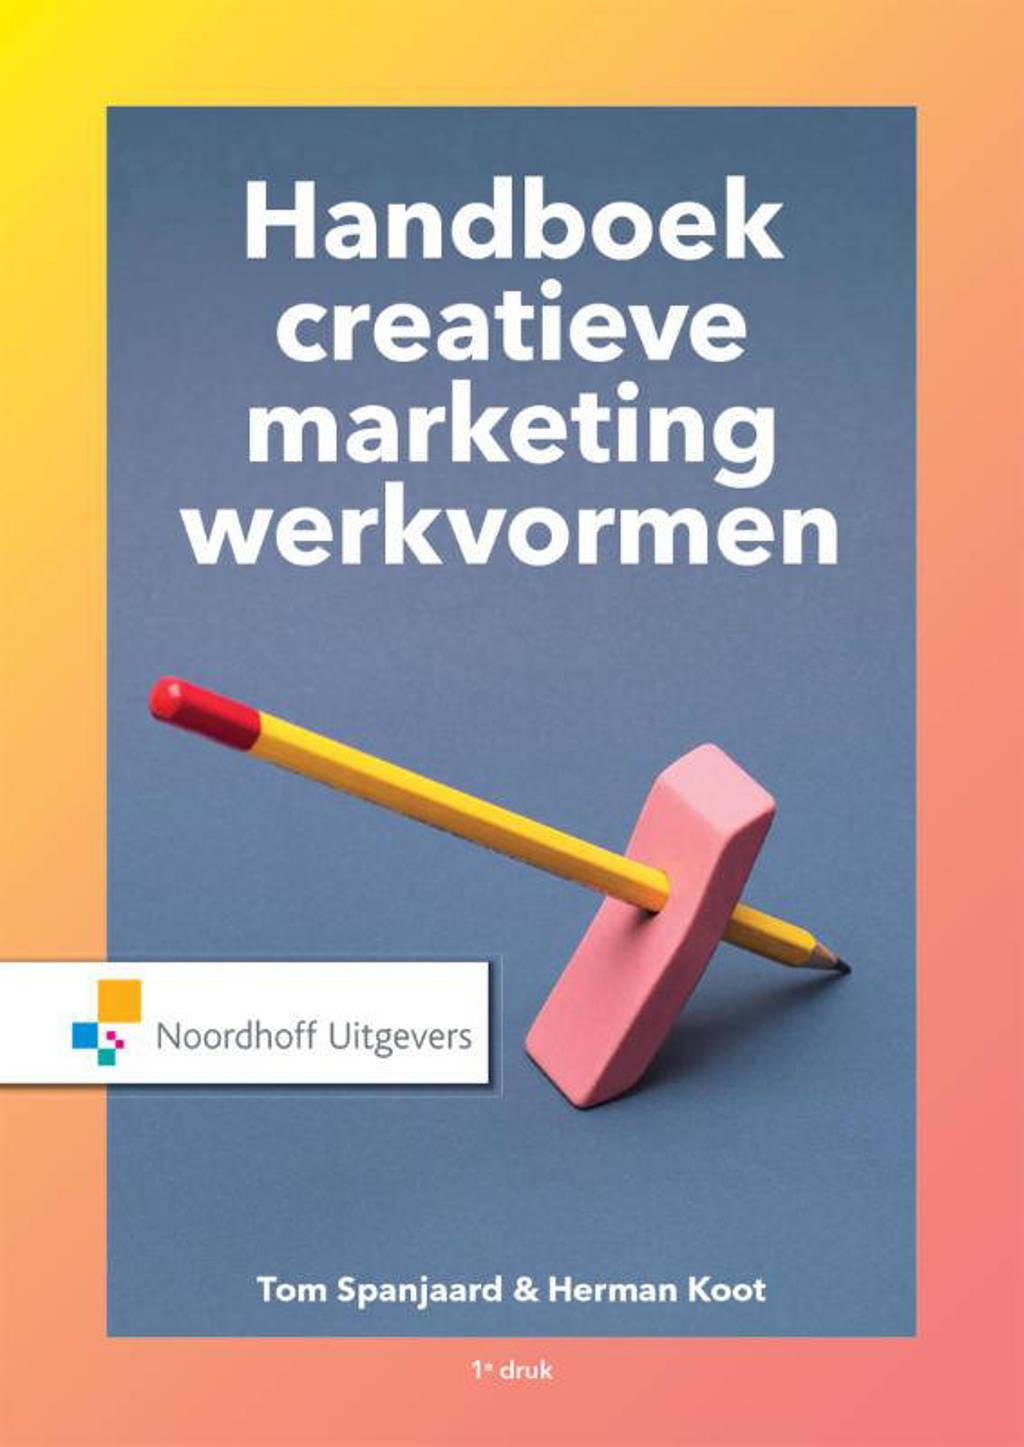 Handboek creatieve marketingwerkvormen - Tom Spanjaard en Herman Koot